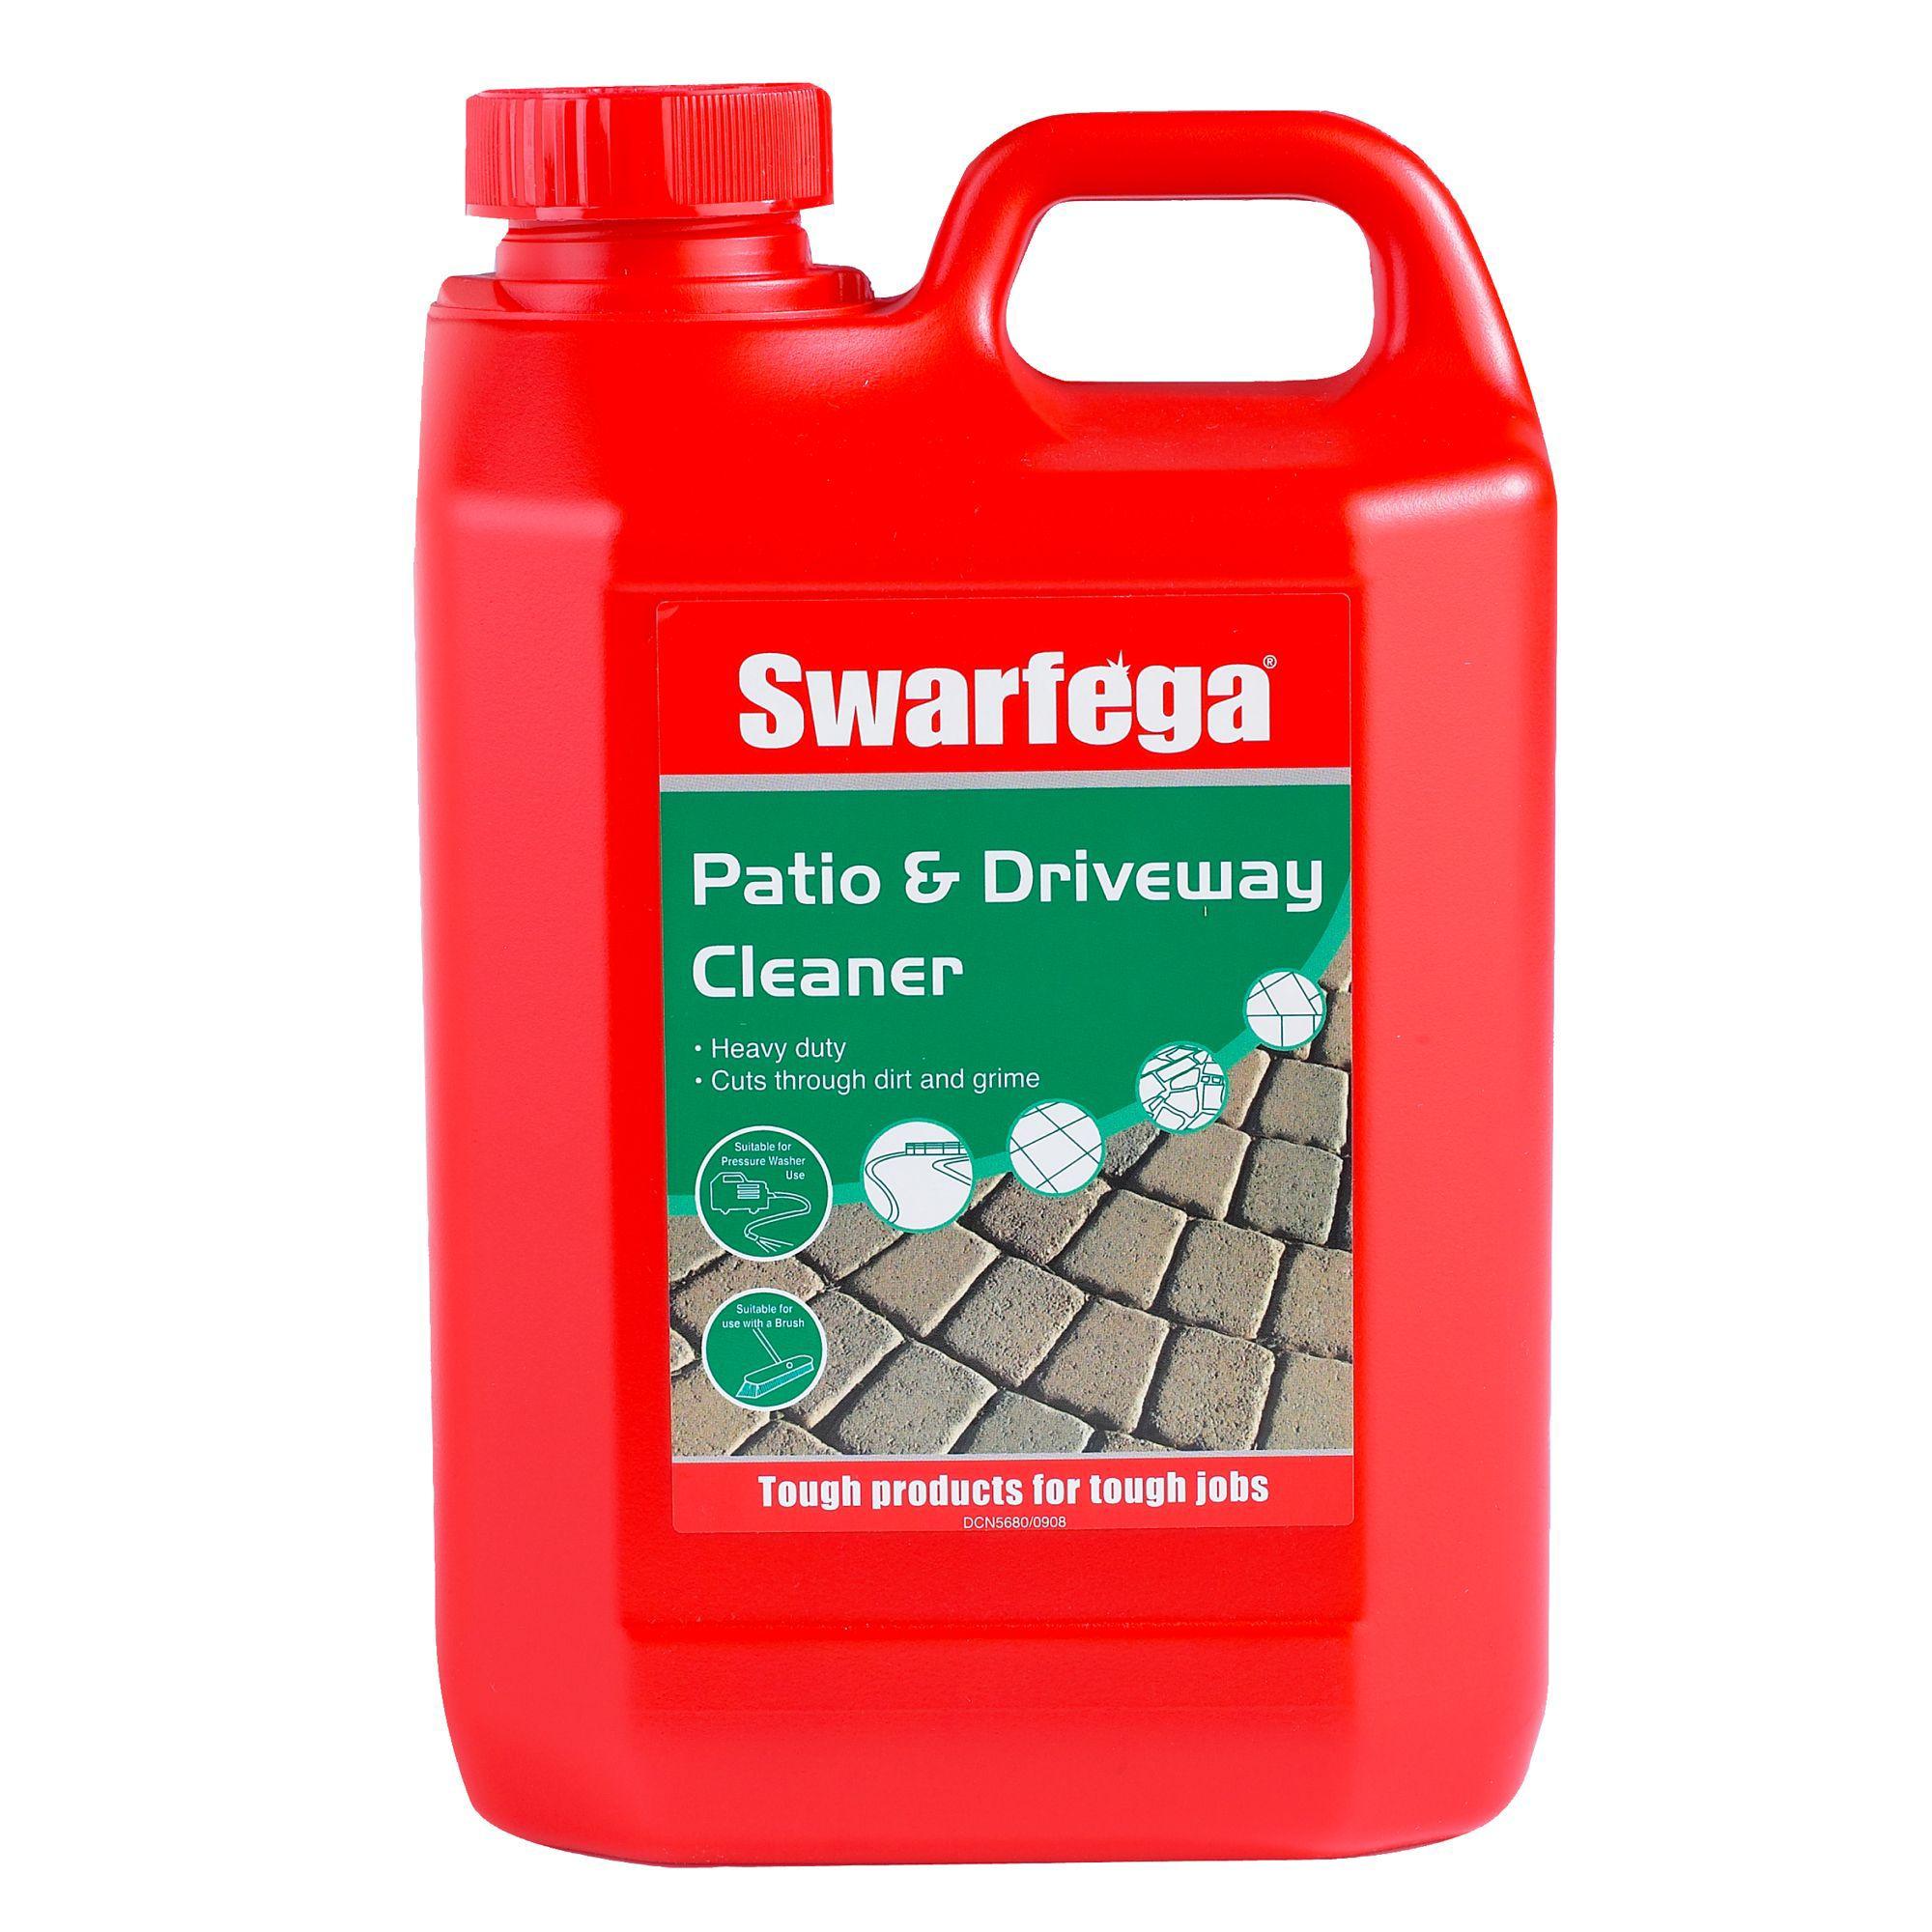 Driveway Lights B Q: Swarfega Patio & Drive Patio & Driveway Cleaner, 2000 Ml